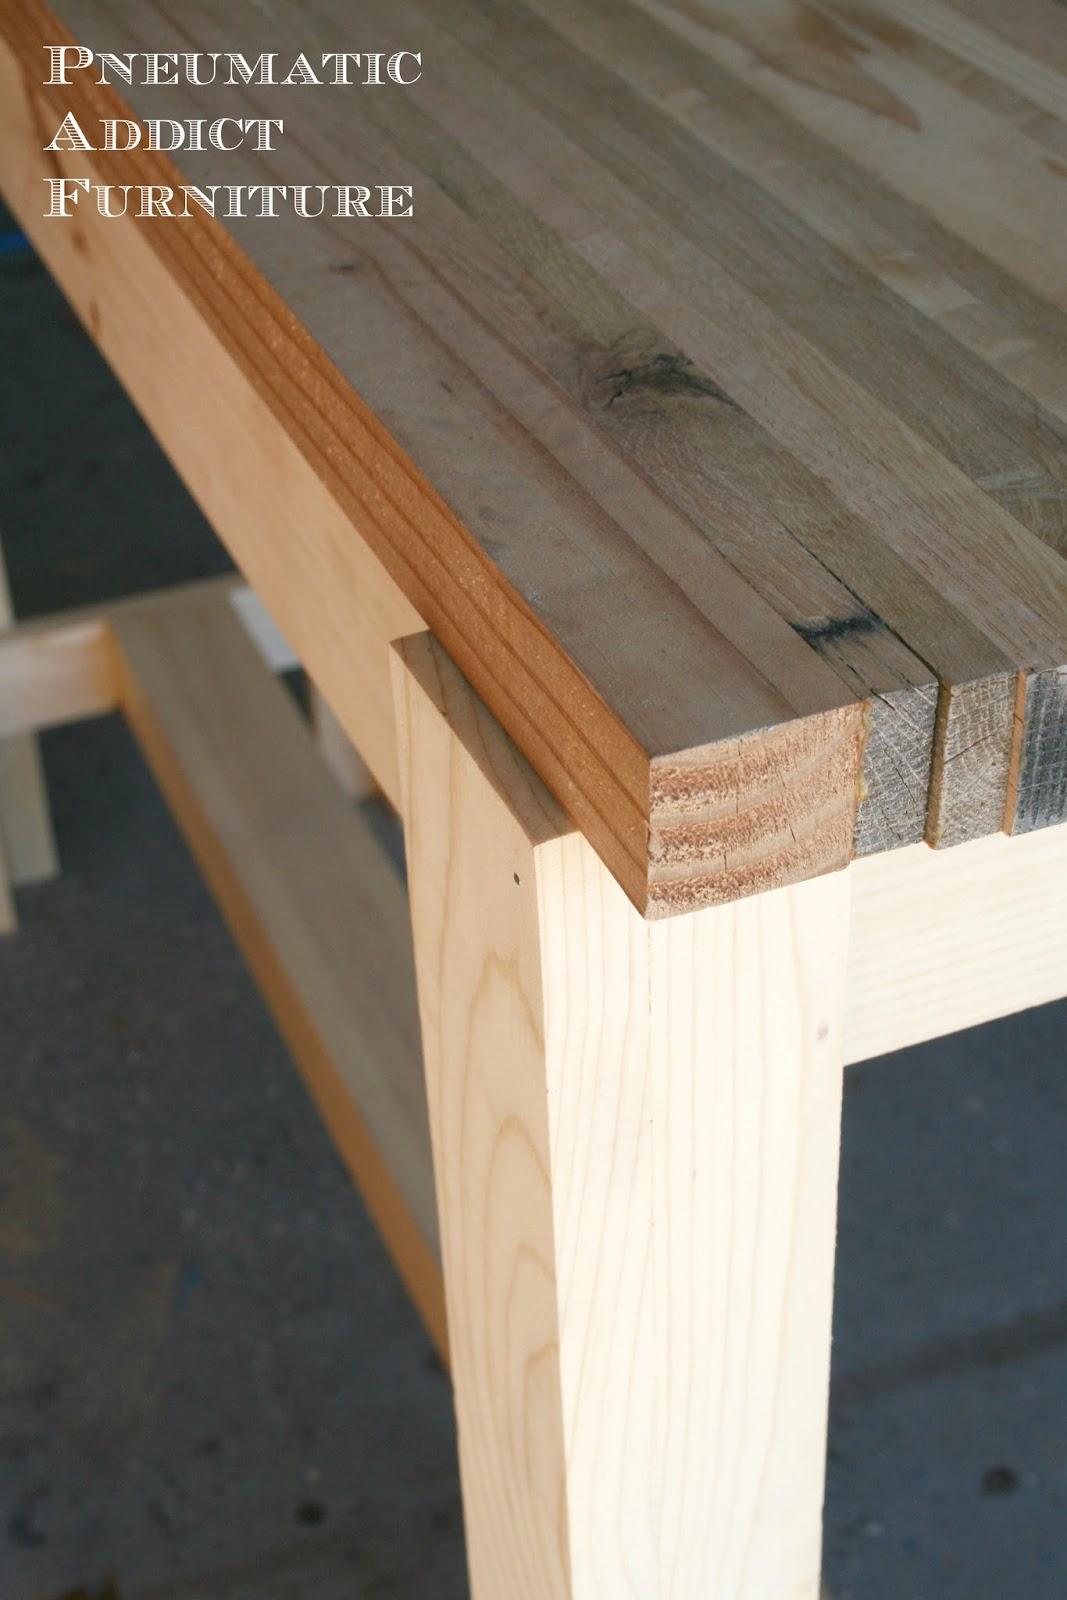 pneumatic addict butcher block sofa table